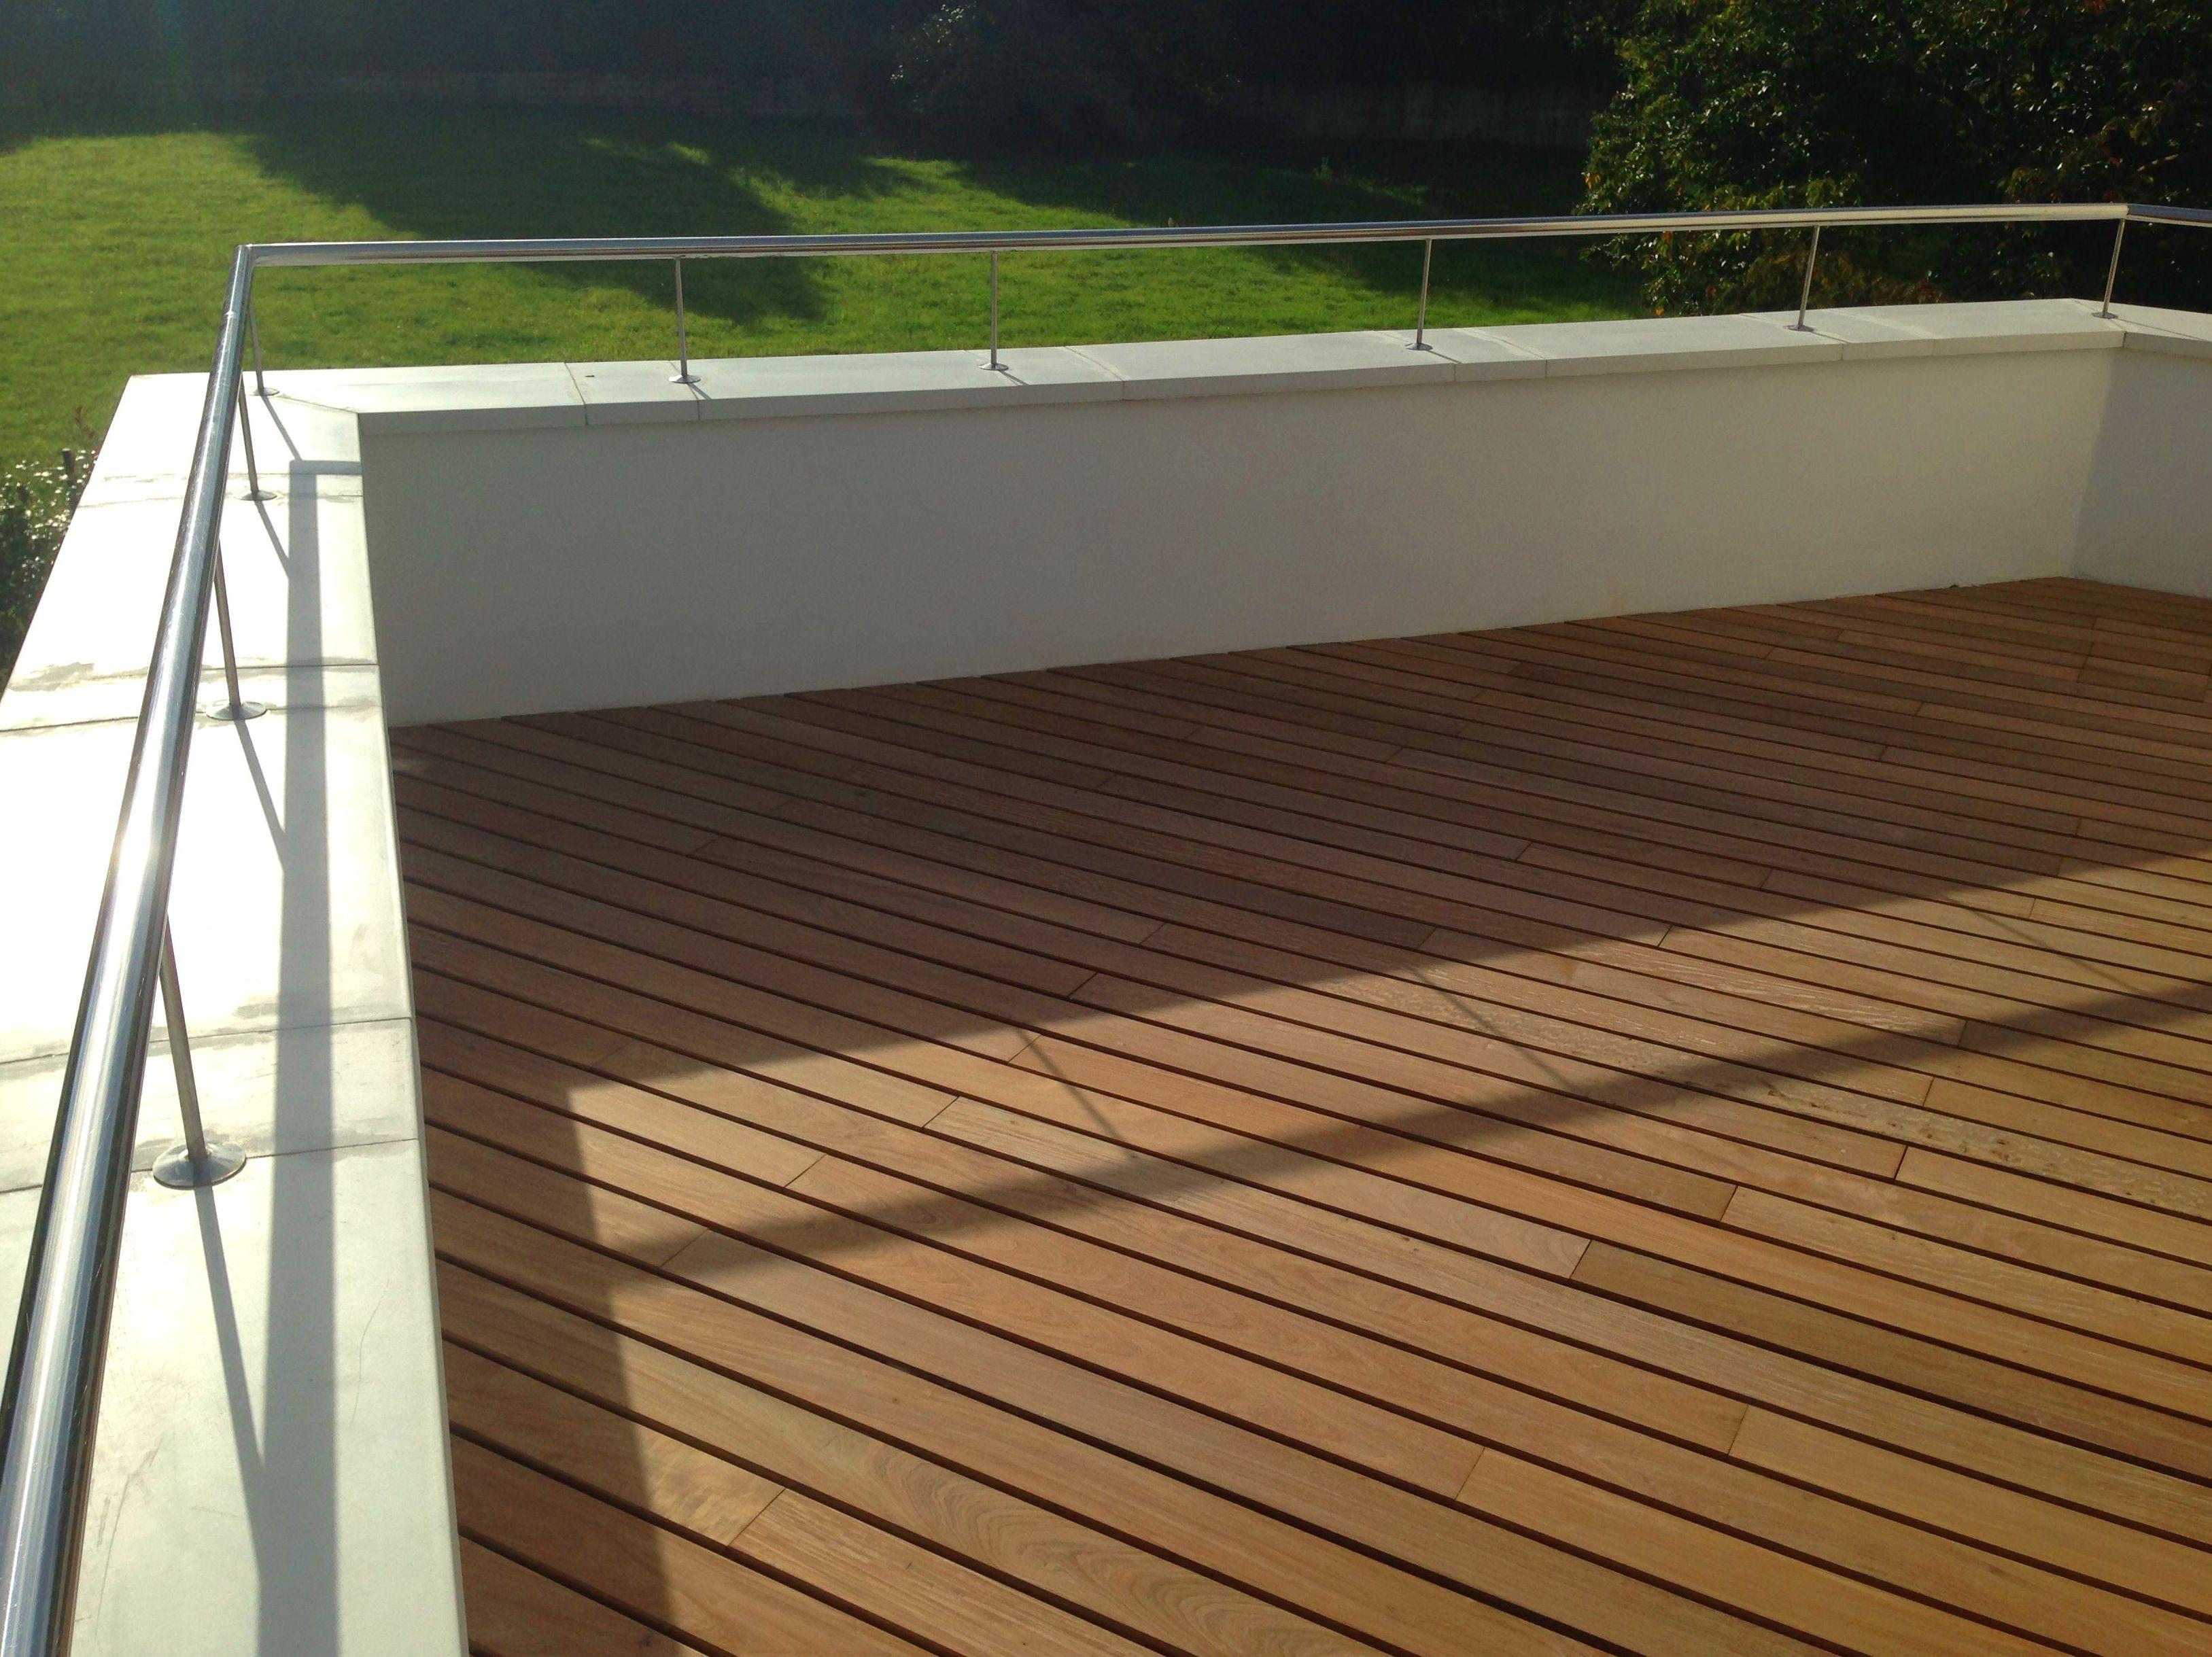 Colocación de tarima de madera ip en terraza. Fachadas Cantabria tarima ipe.